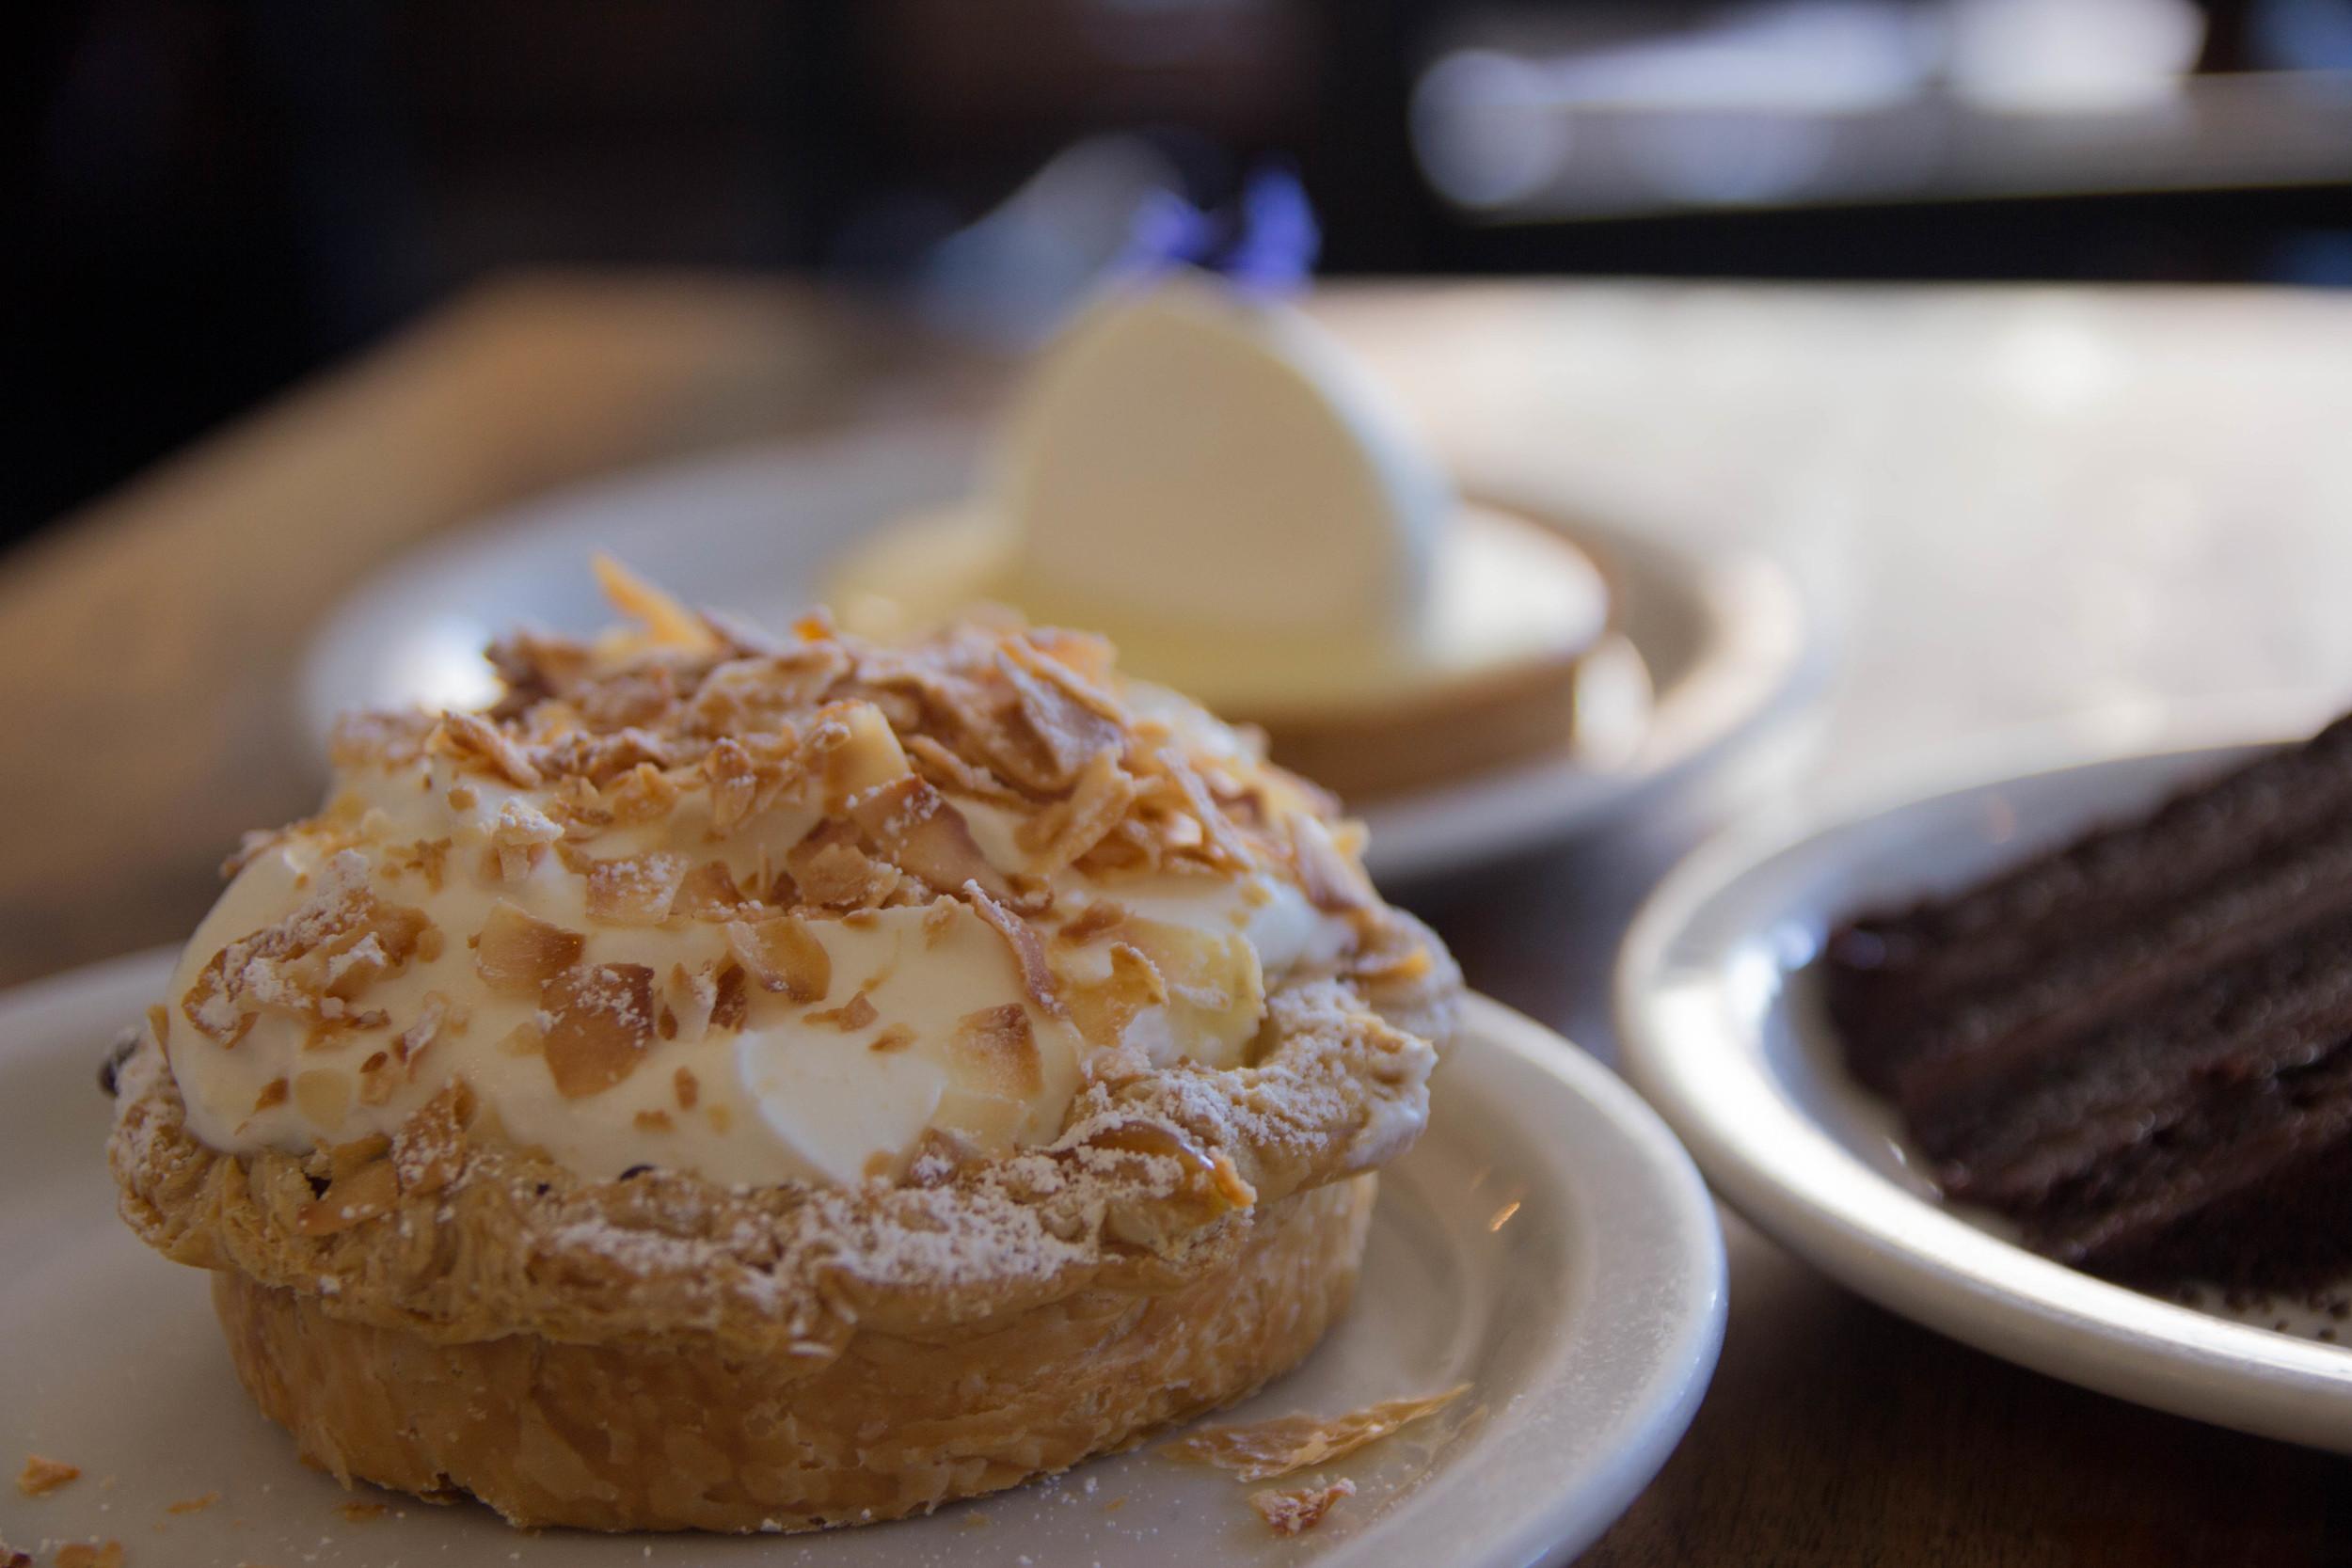 tartine bakery, san francisco, california